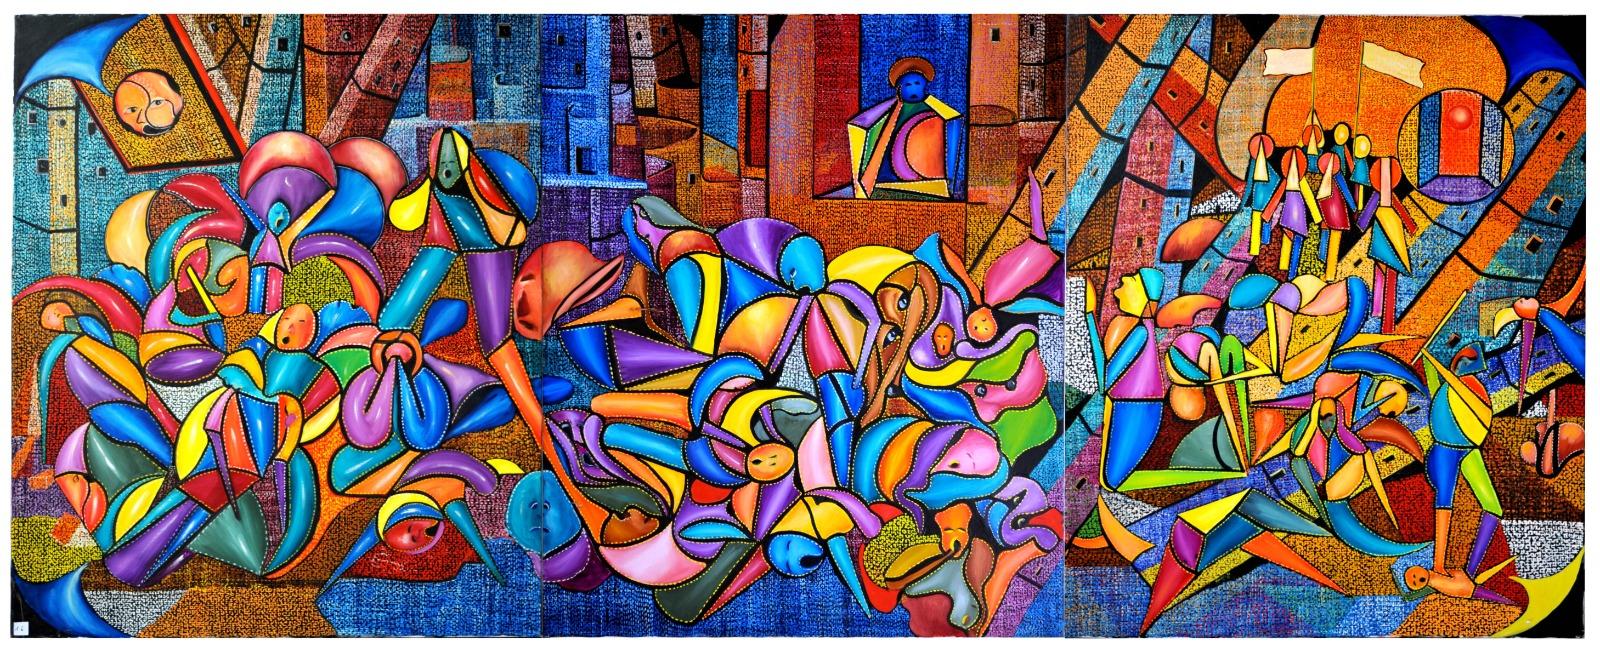 Mario Angelo Vacca - Ieri, oggi, domani - olio su tela (trittico) - 300x100 cm